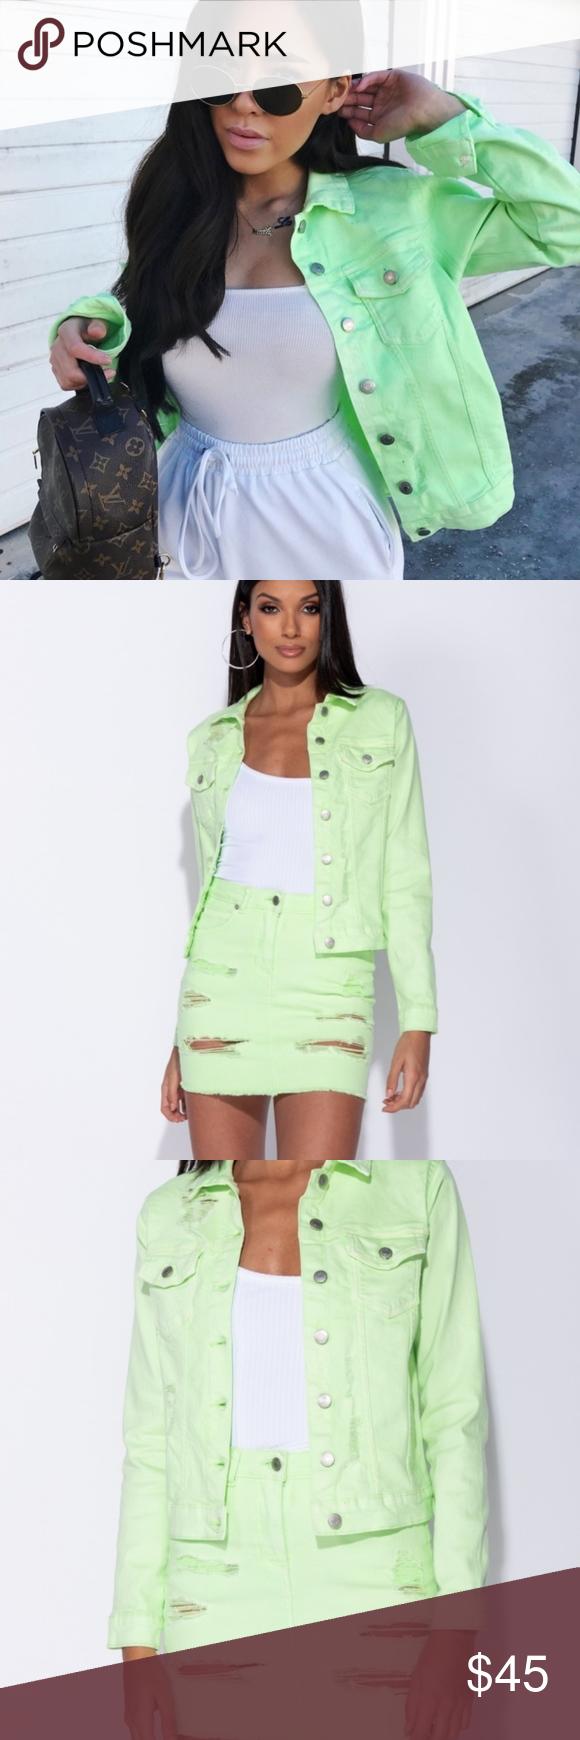 Trend Alert Neon Green Denim Jean Jacket Brand New Gorgeous Neon Lime Green Denim Jacket With Ripped Look Throu Denim Jean Jacket Chic Jeans Distressed Denim [ 1740 x 580 Pixel ]